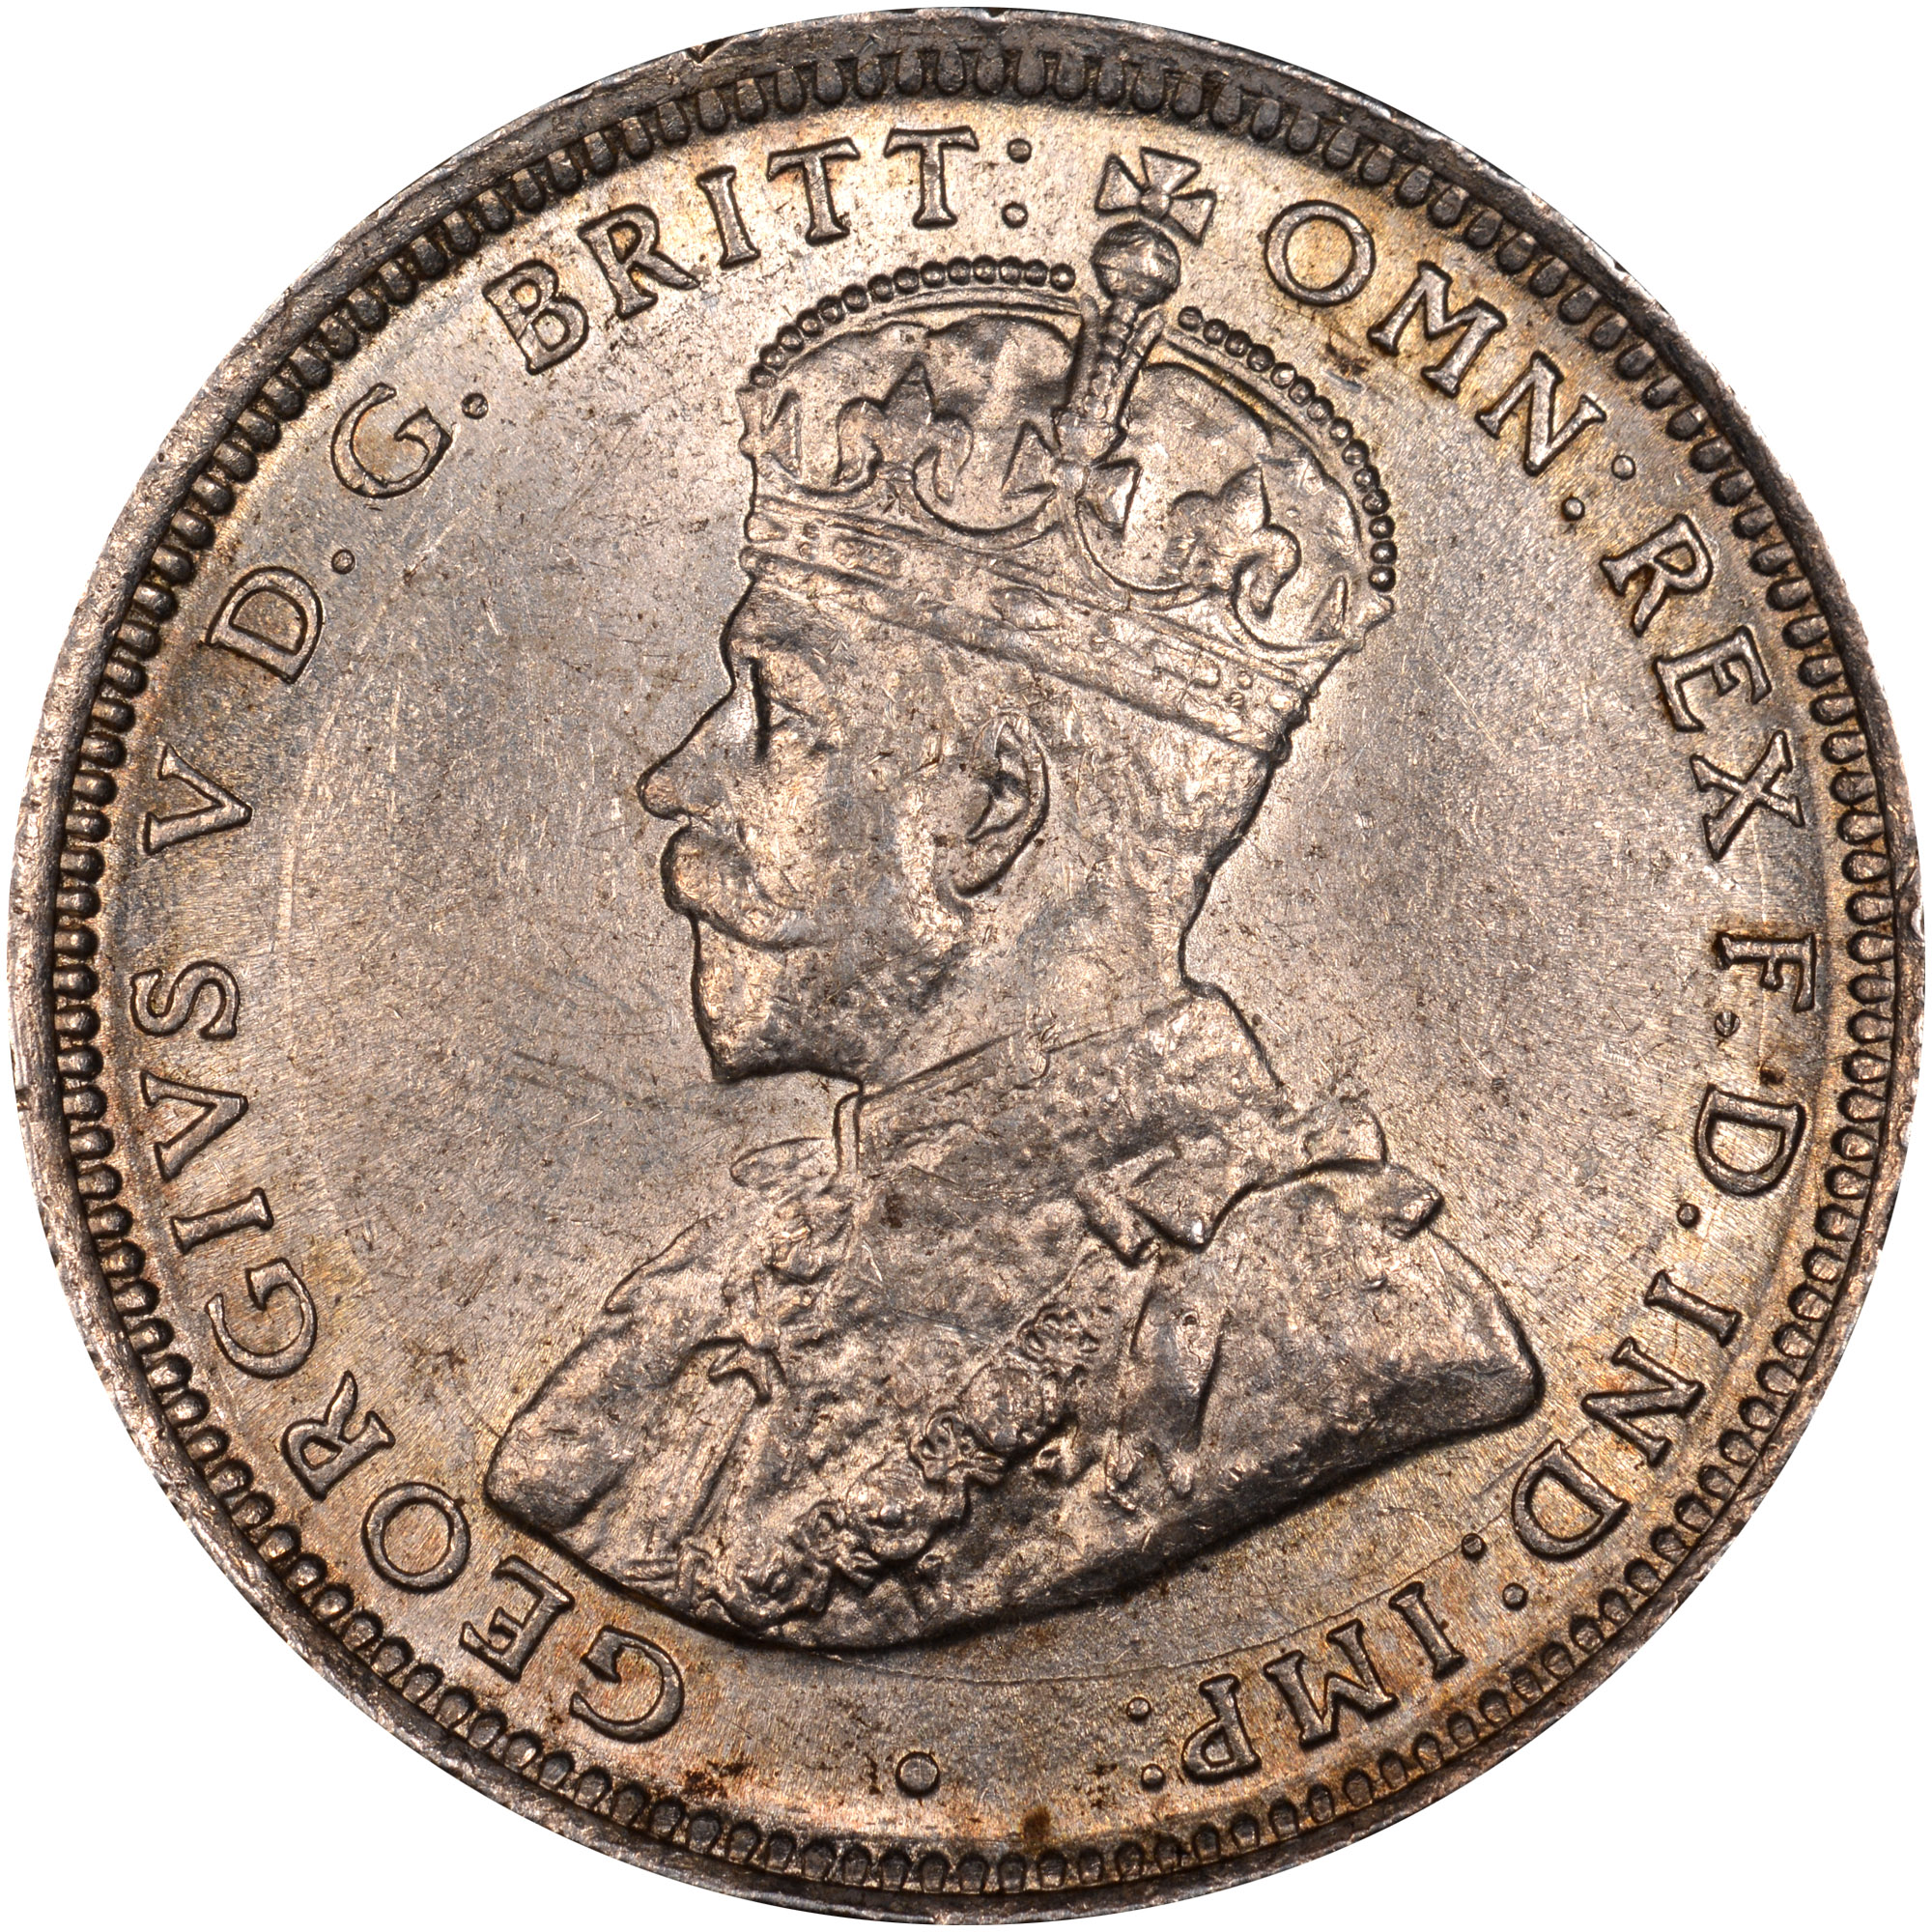 1913-1920 British West Africa Shilling obverse